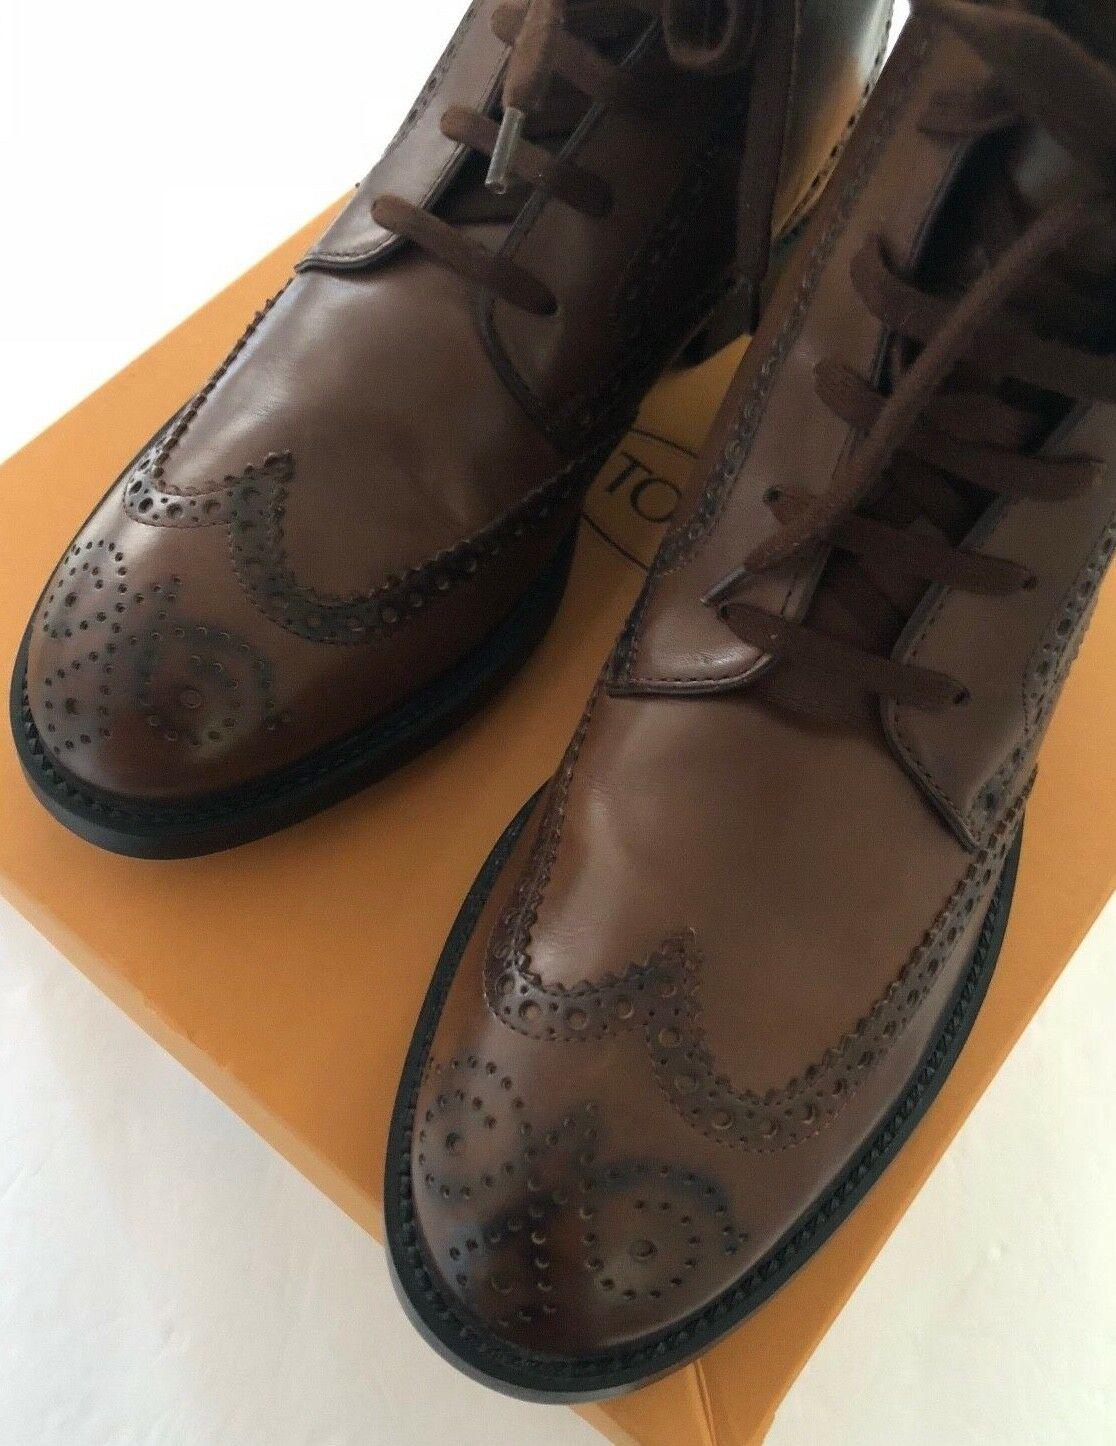 Zapato Bota Tods 7.5 8 Stiv. todos Bucature Esquire Giovane Cacao Marrón Brogue Italia